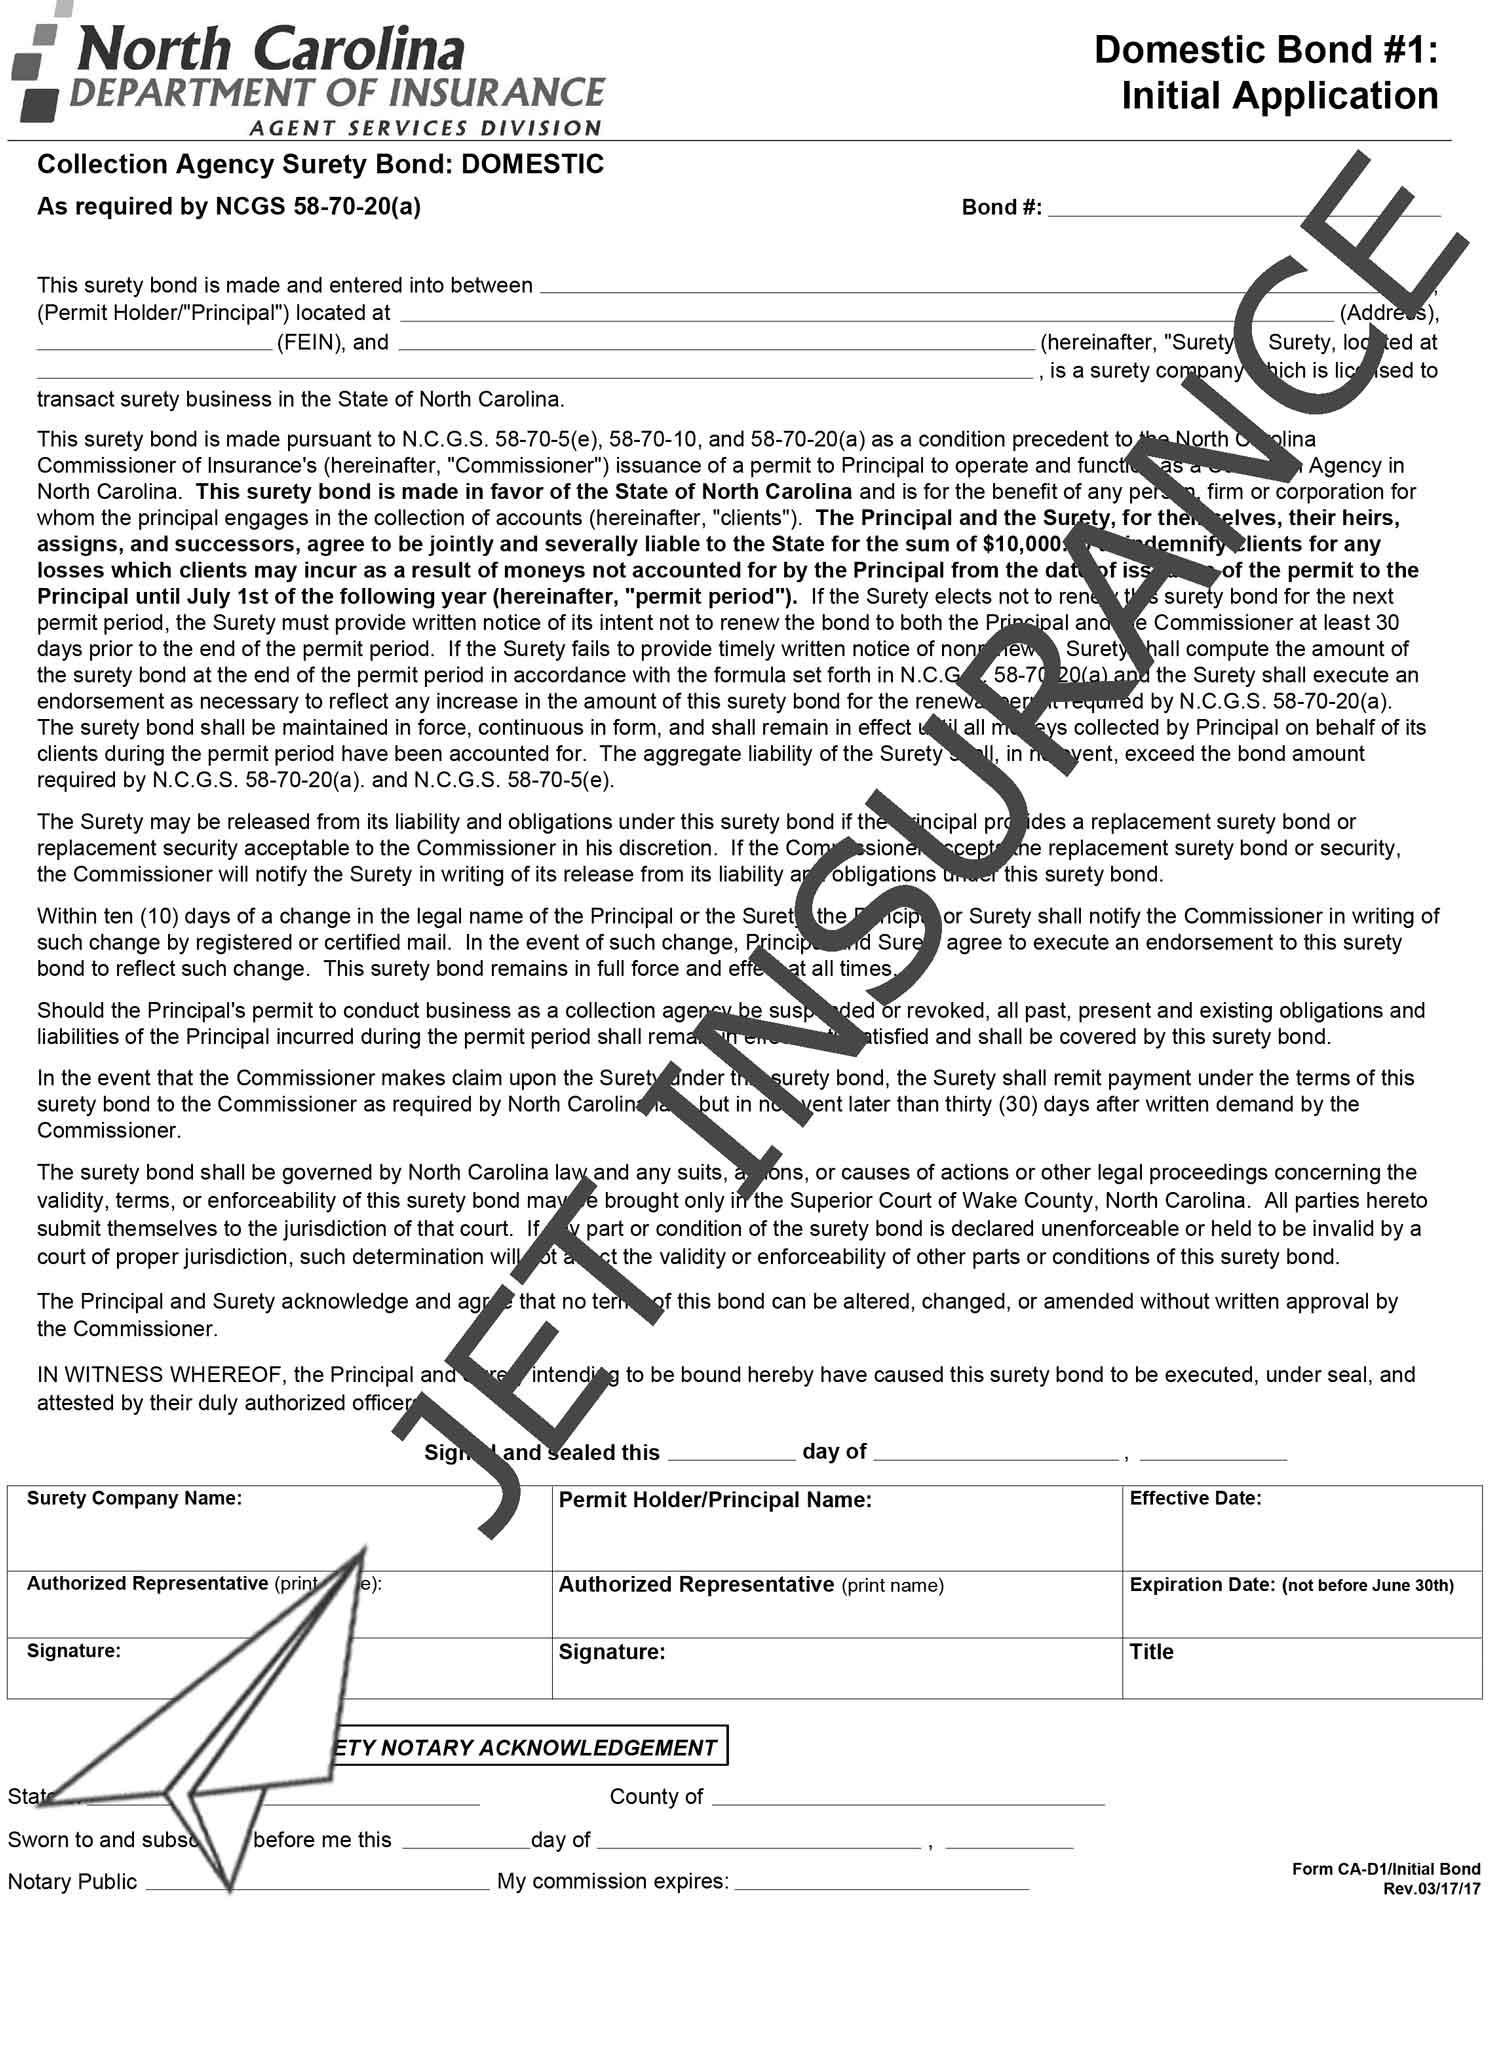 North Carolina Collection Agency Bonds Form